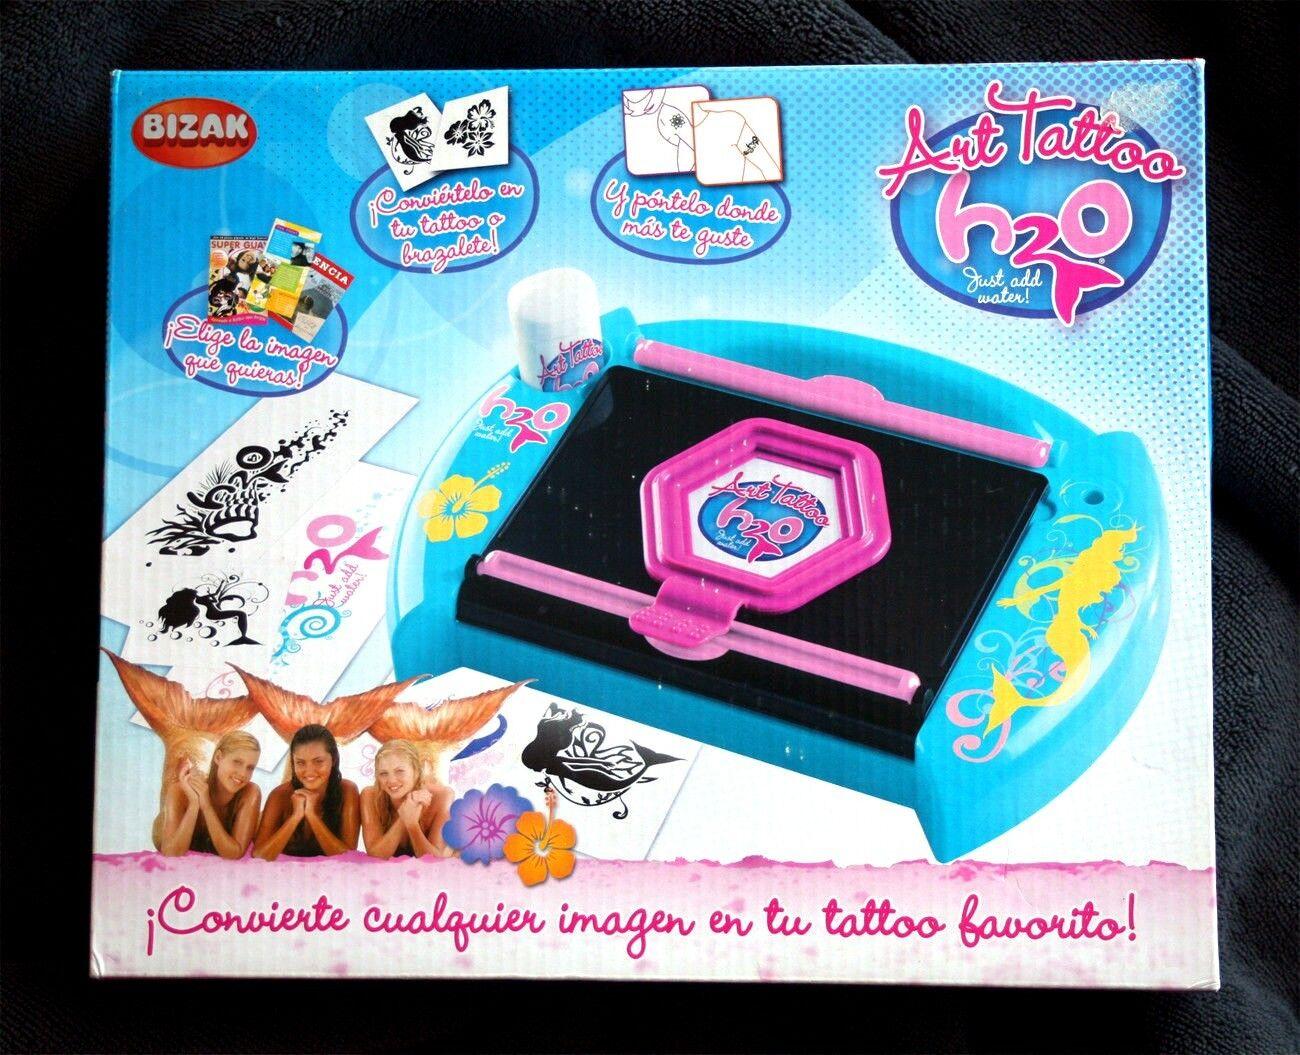 H2O ART TATTOO (SALÓN TATUAJES, NO MUÑECA, SIRENA TV SHOW). BRAND NEW IN BOX OS